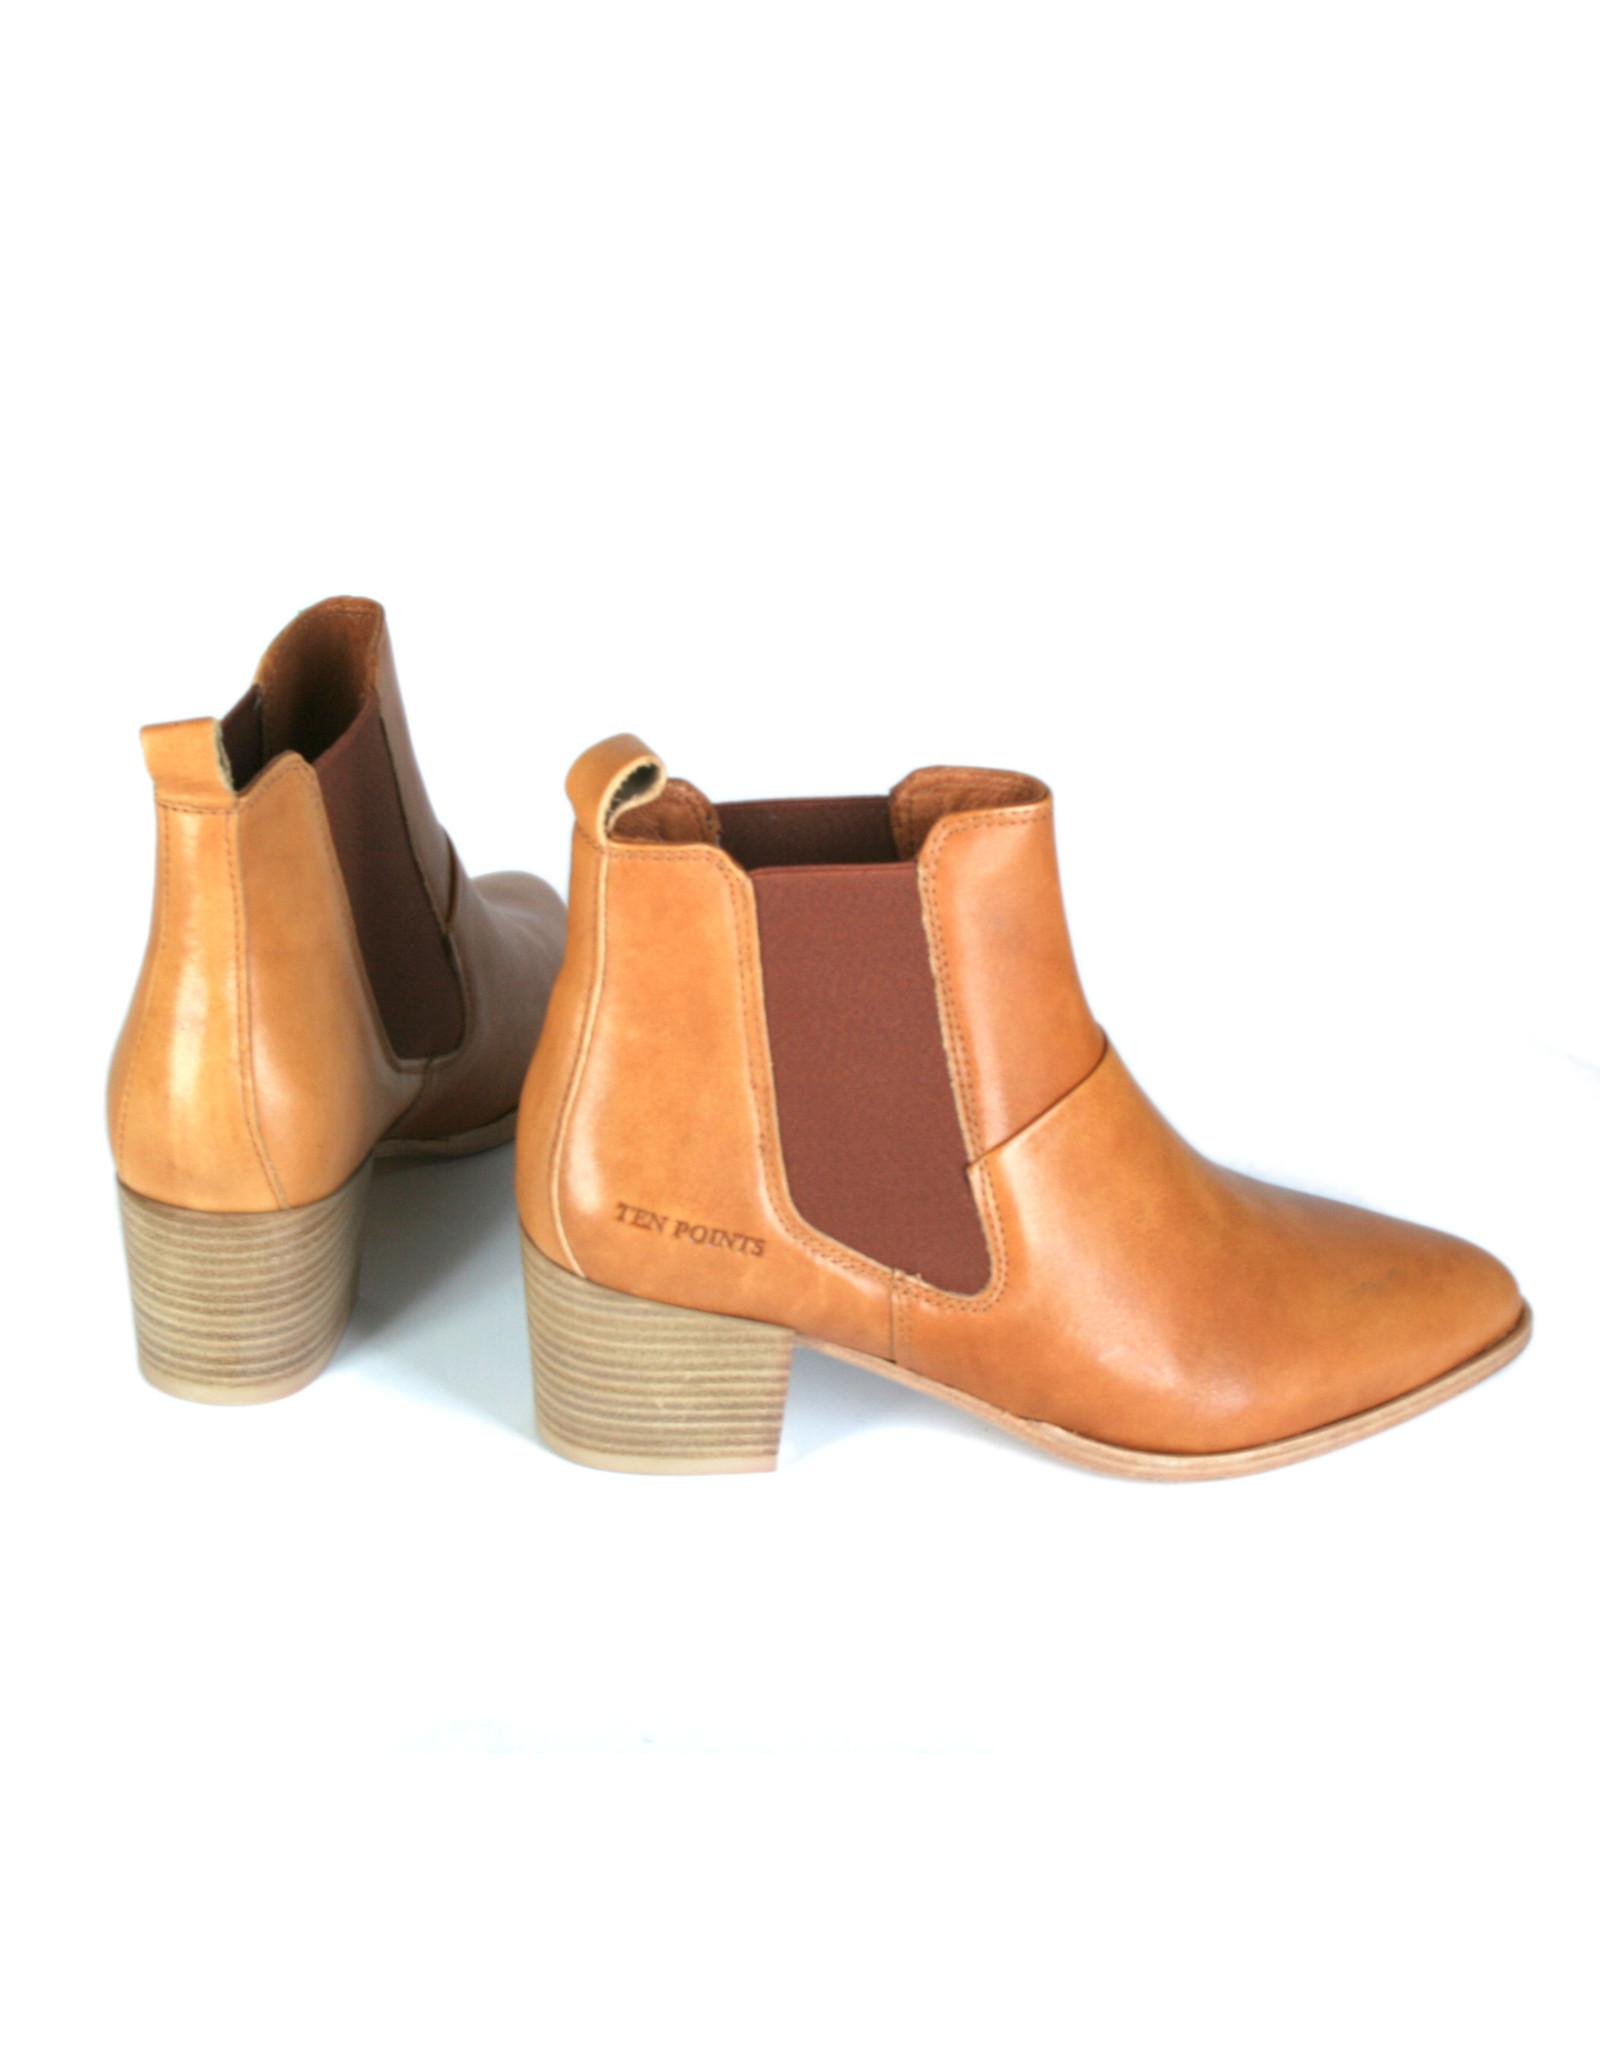 Ten Points Boots